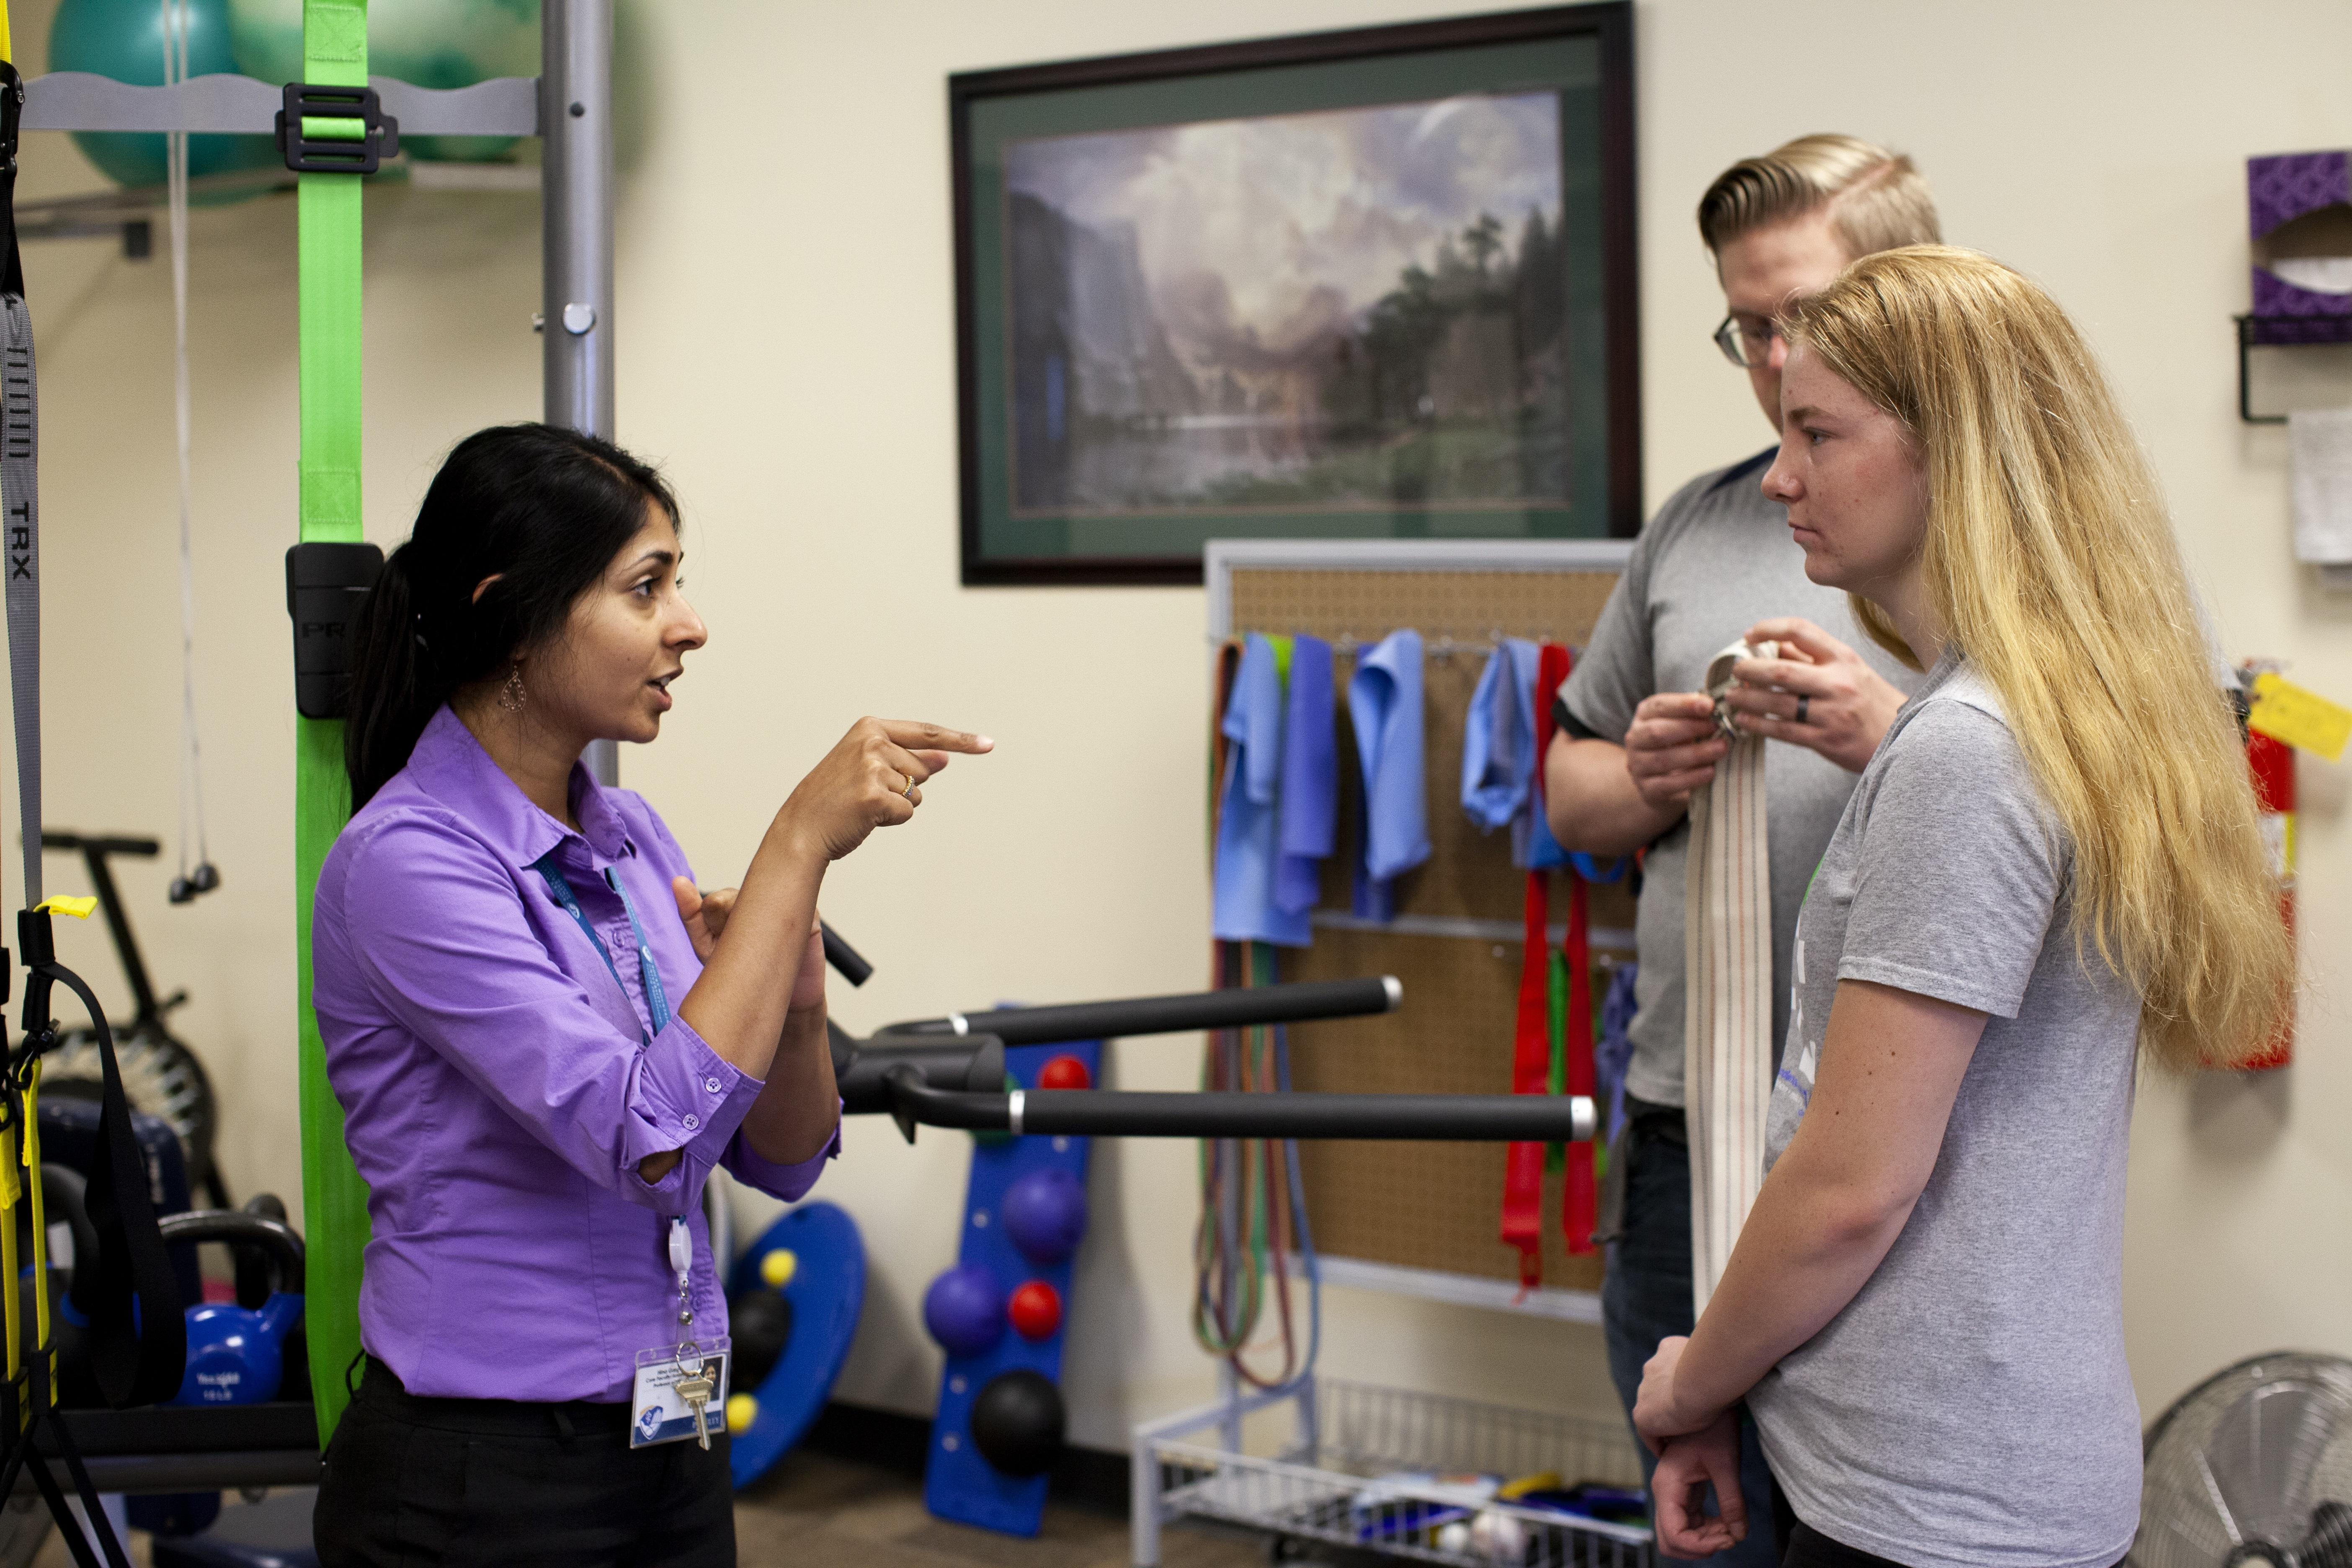 Dr Garg instructing volunteers